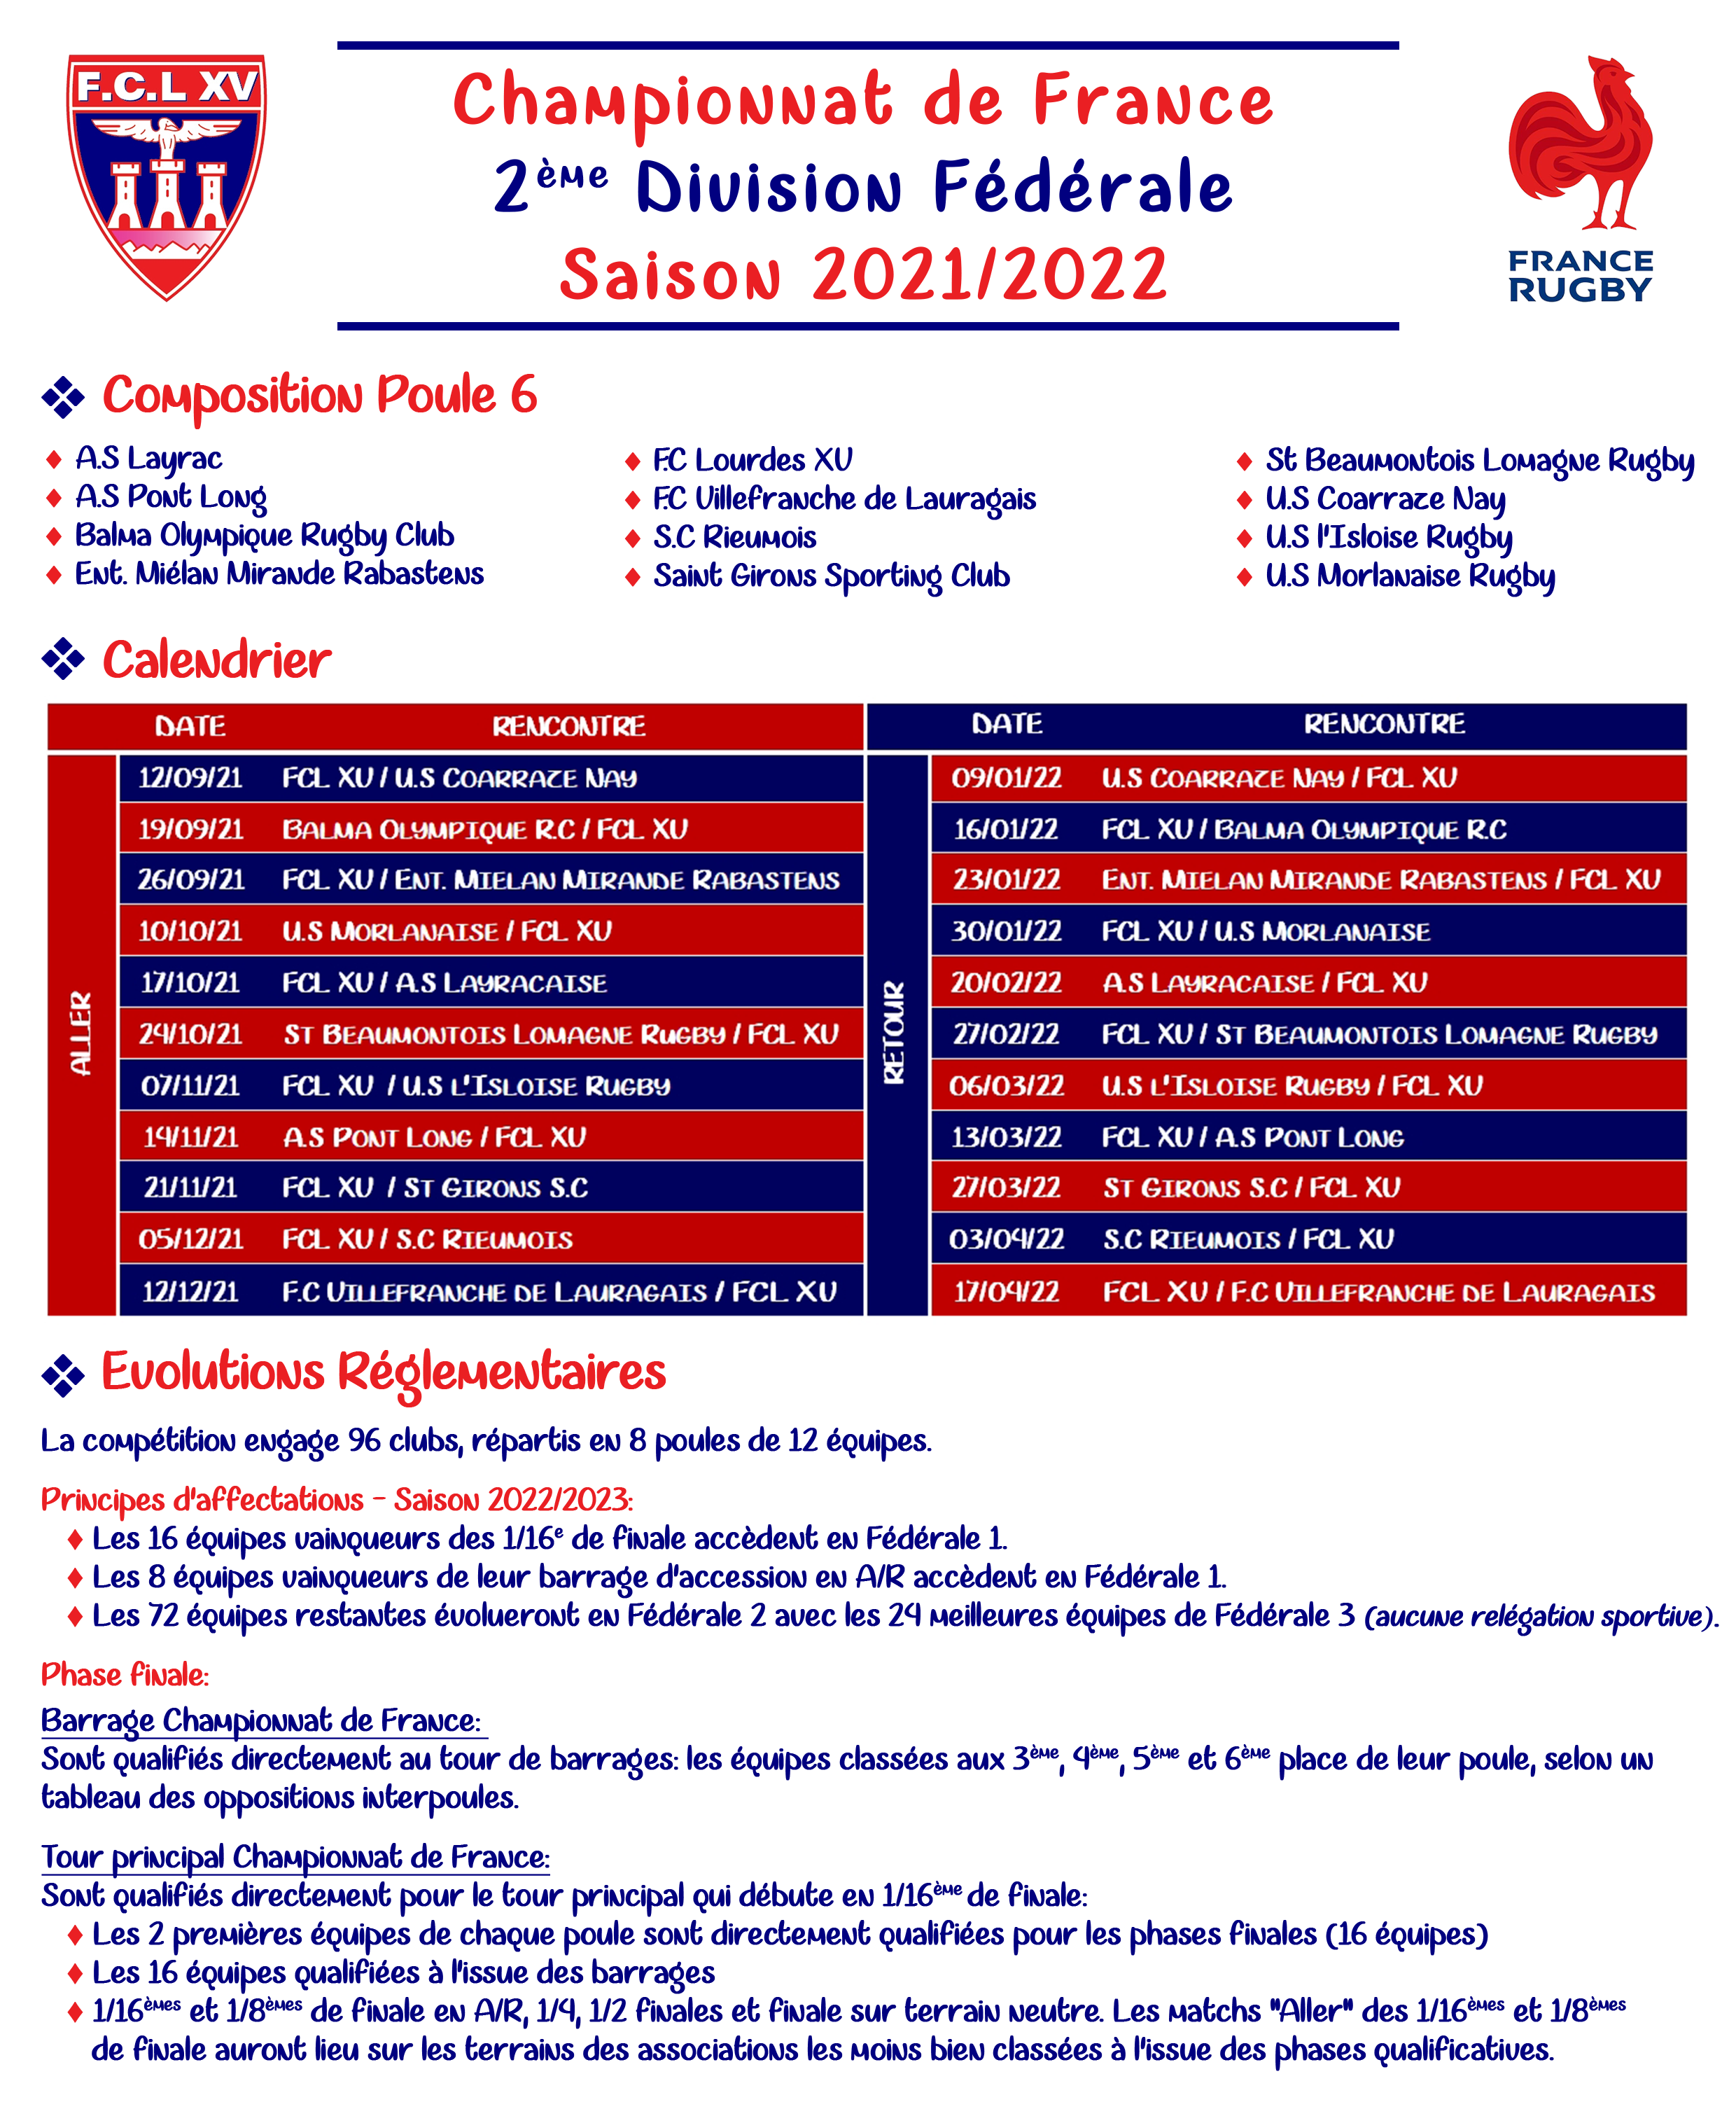 2DF_2021-2022.png